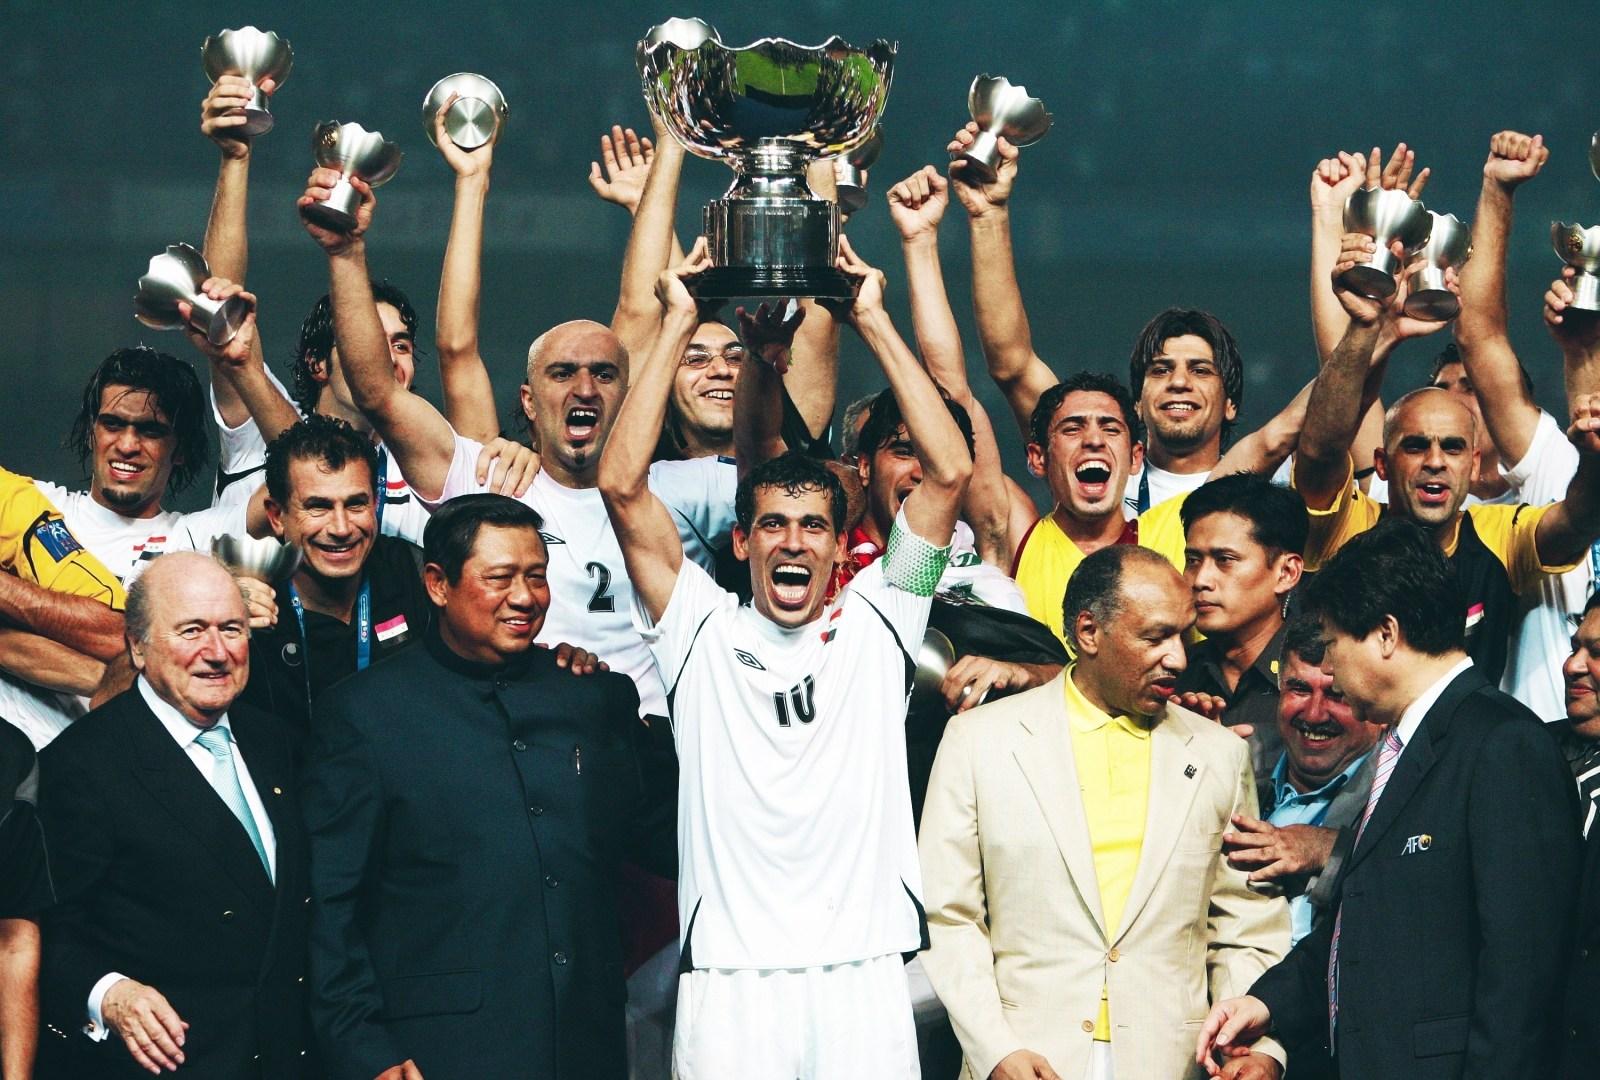 Fakta Final Piala Asia Tahun 2000 Hingga Sekarang 5